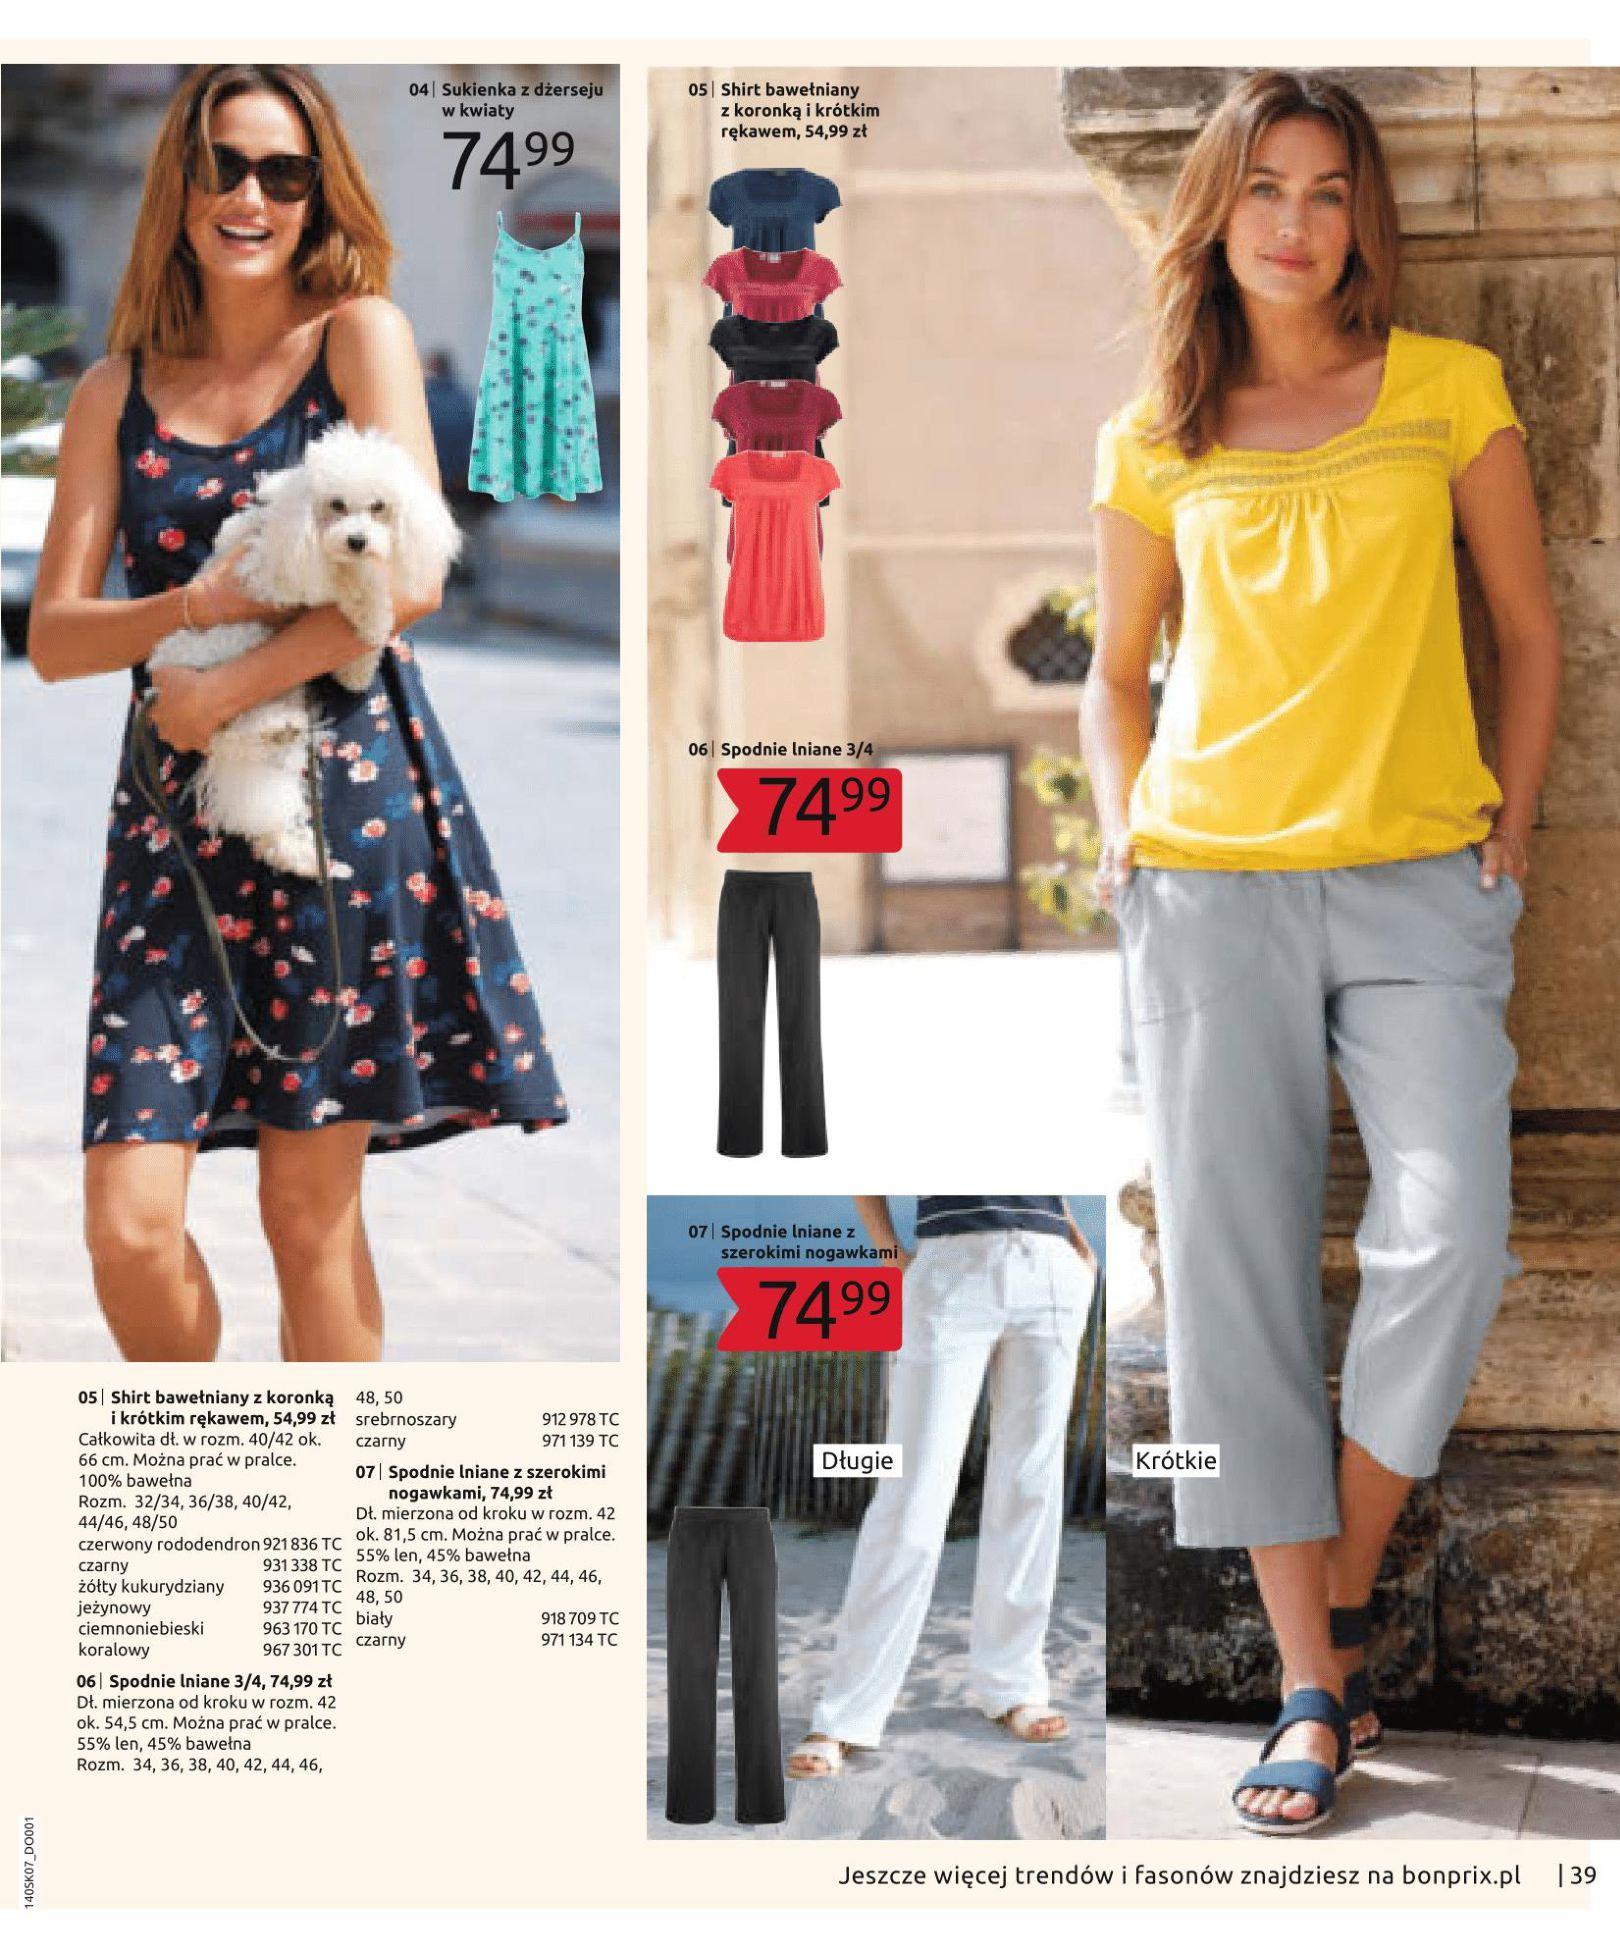 Gazetka Bonprix - Letnie trendy-02.07.2019-15.01.2020-page-41